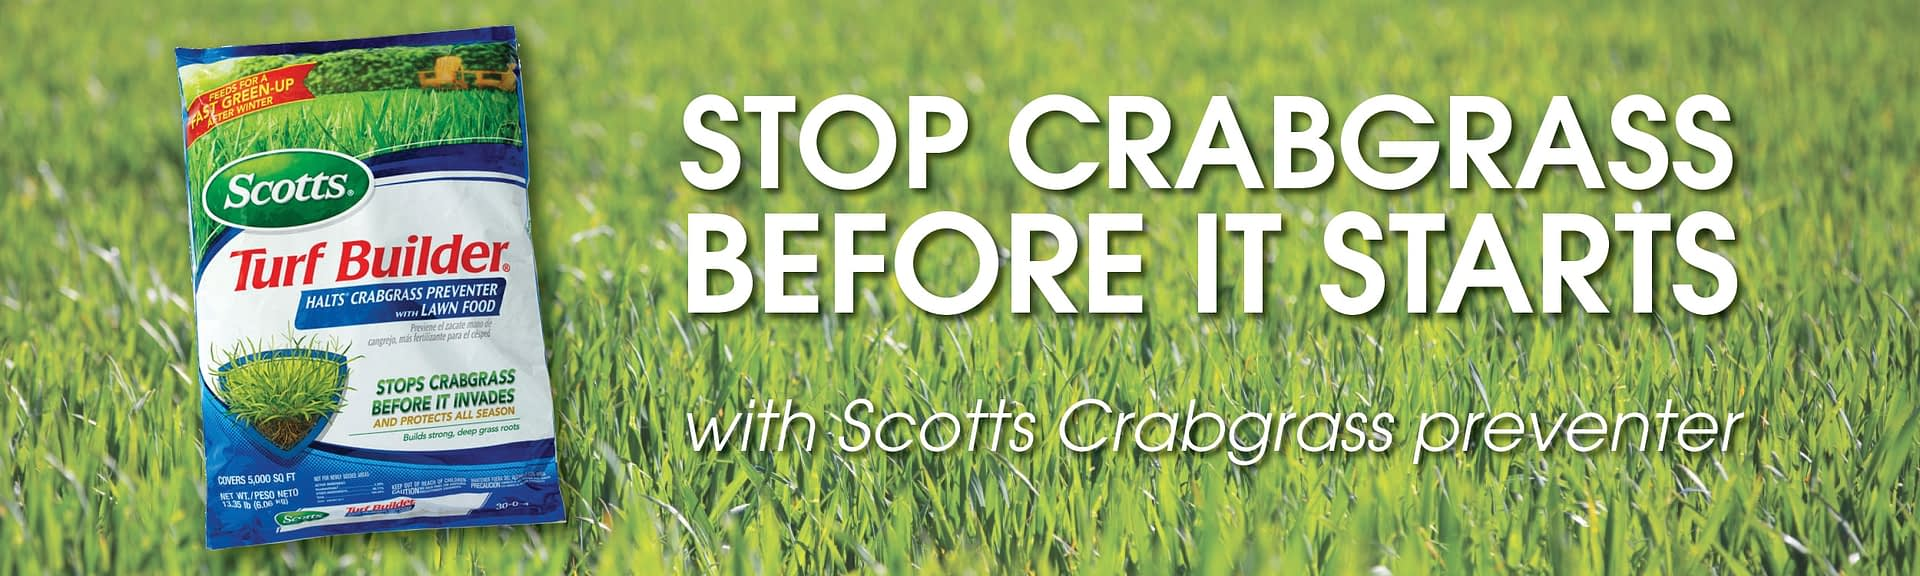 Scotts Crabgrass